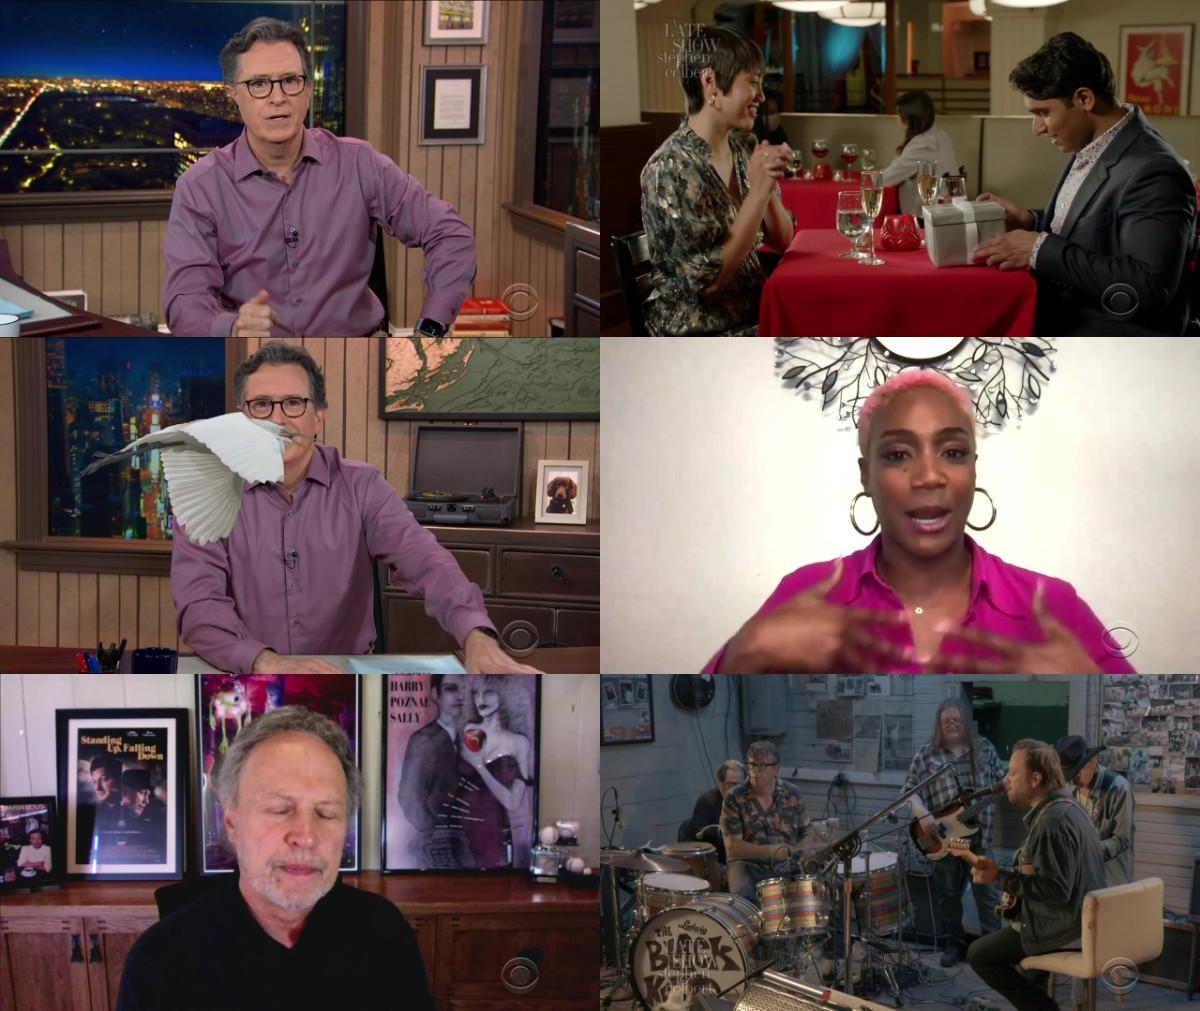 Stephen Colbert 2021 05 14 Billy Crystal 720p WEB H264-JEBAITED